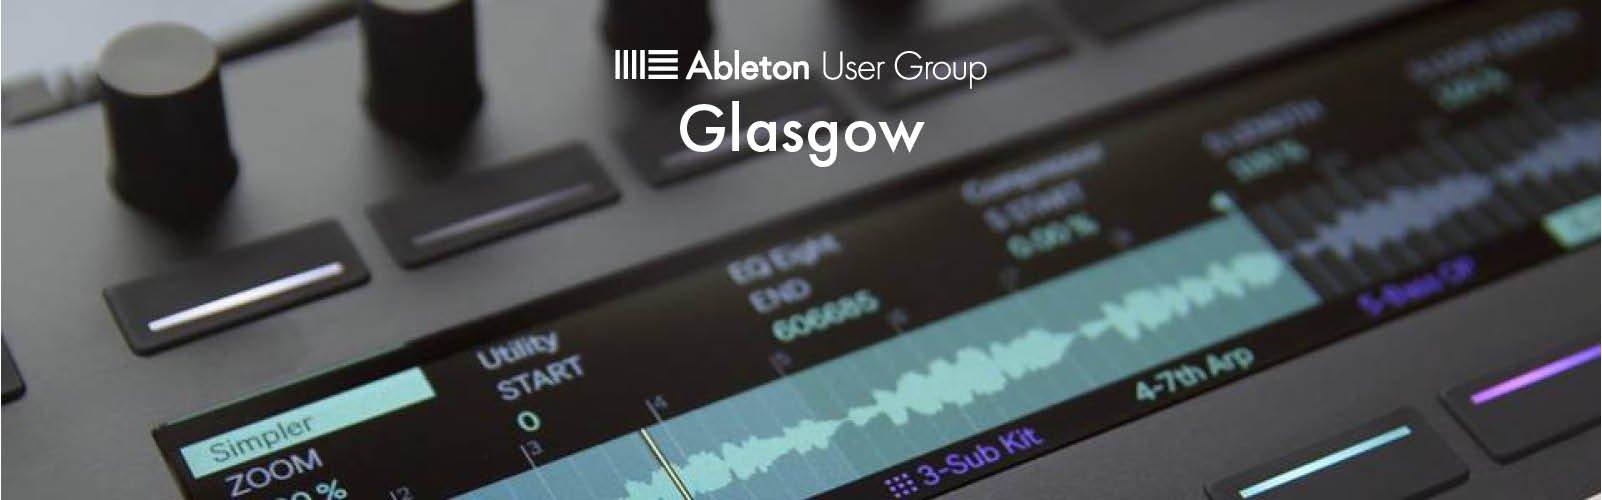 Glasgow UG Banner 2.jpg